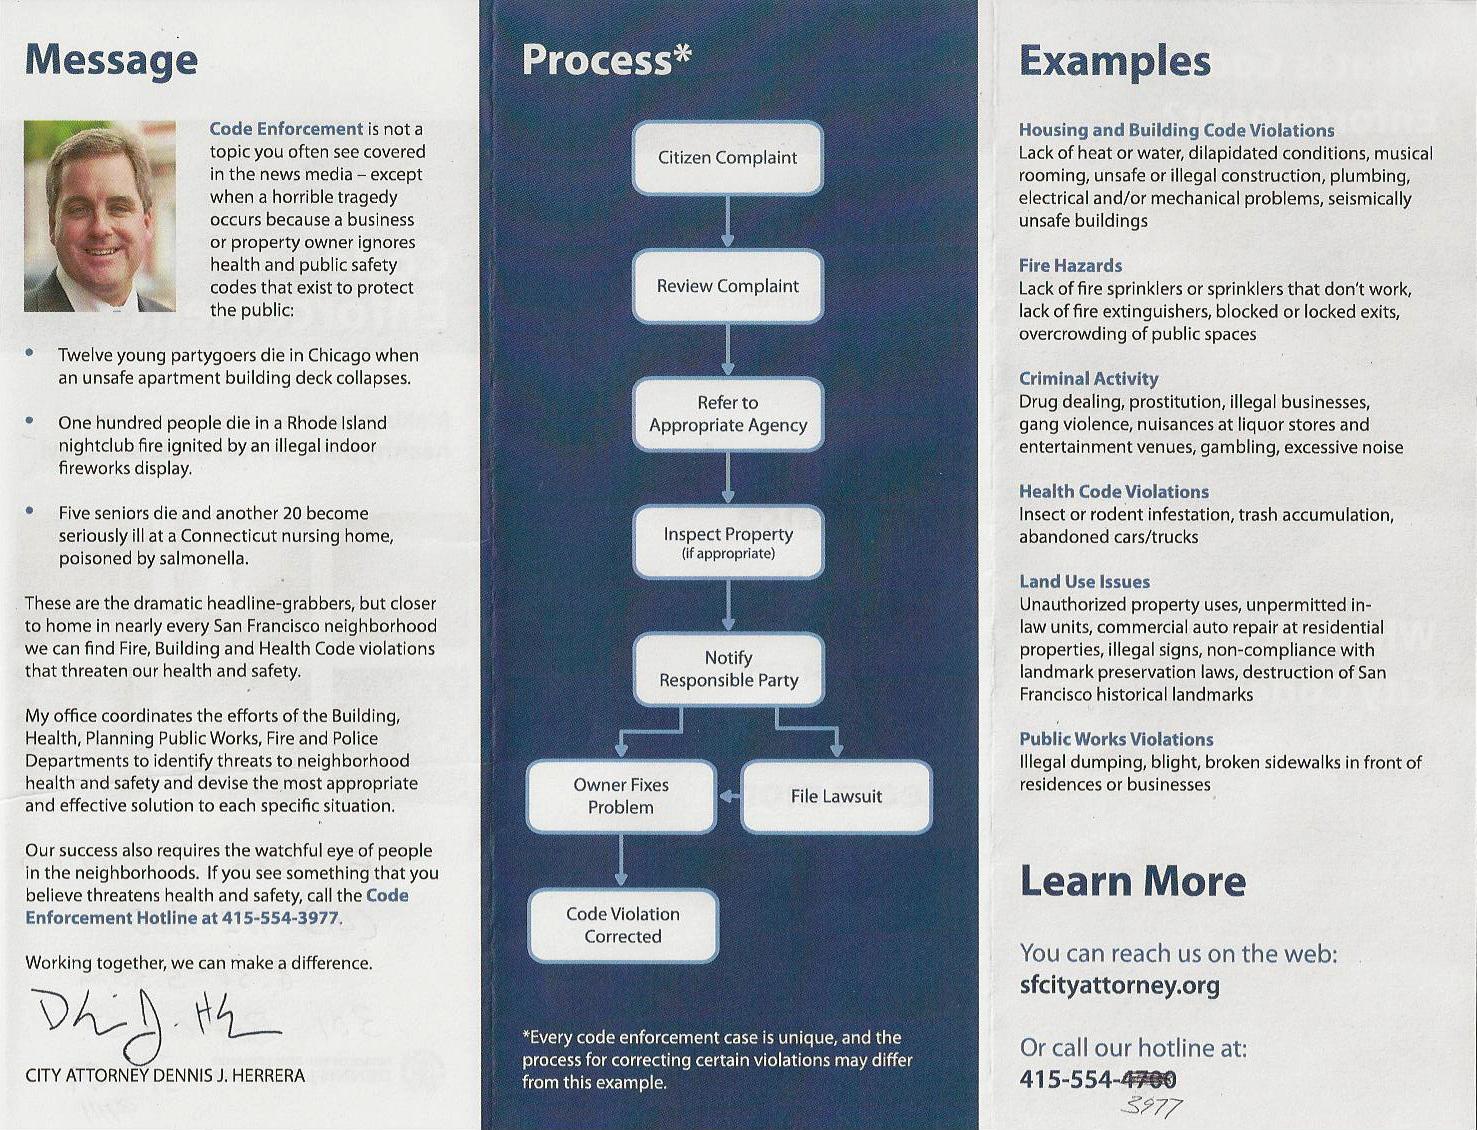 Digital Fingerprint Services: DHS Service Codes